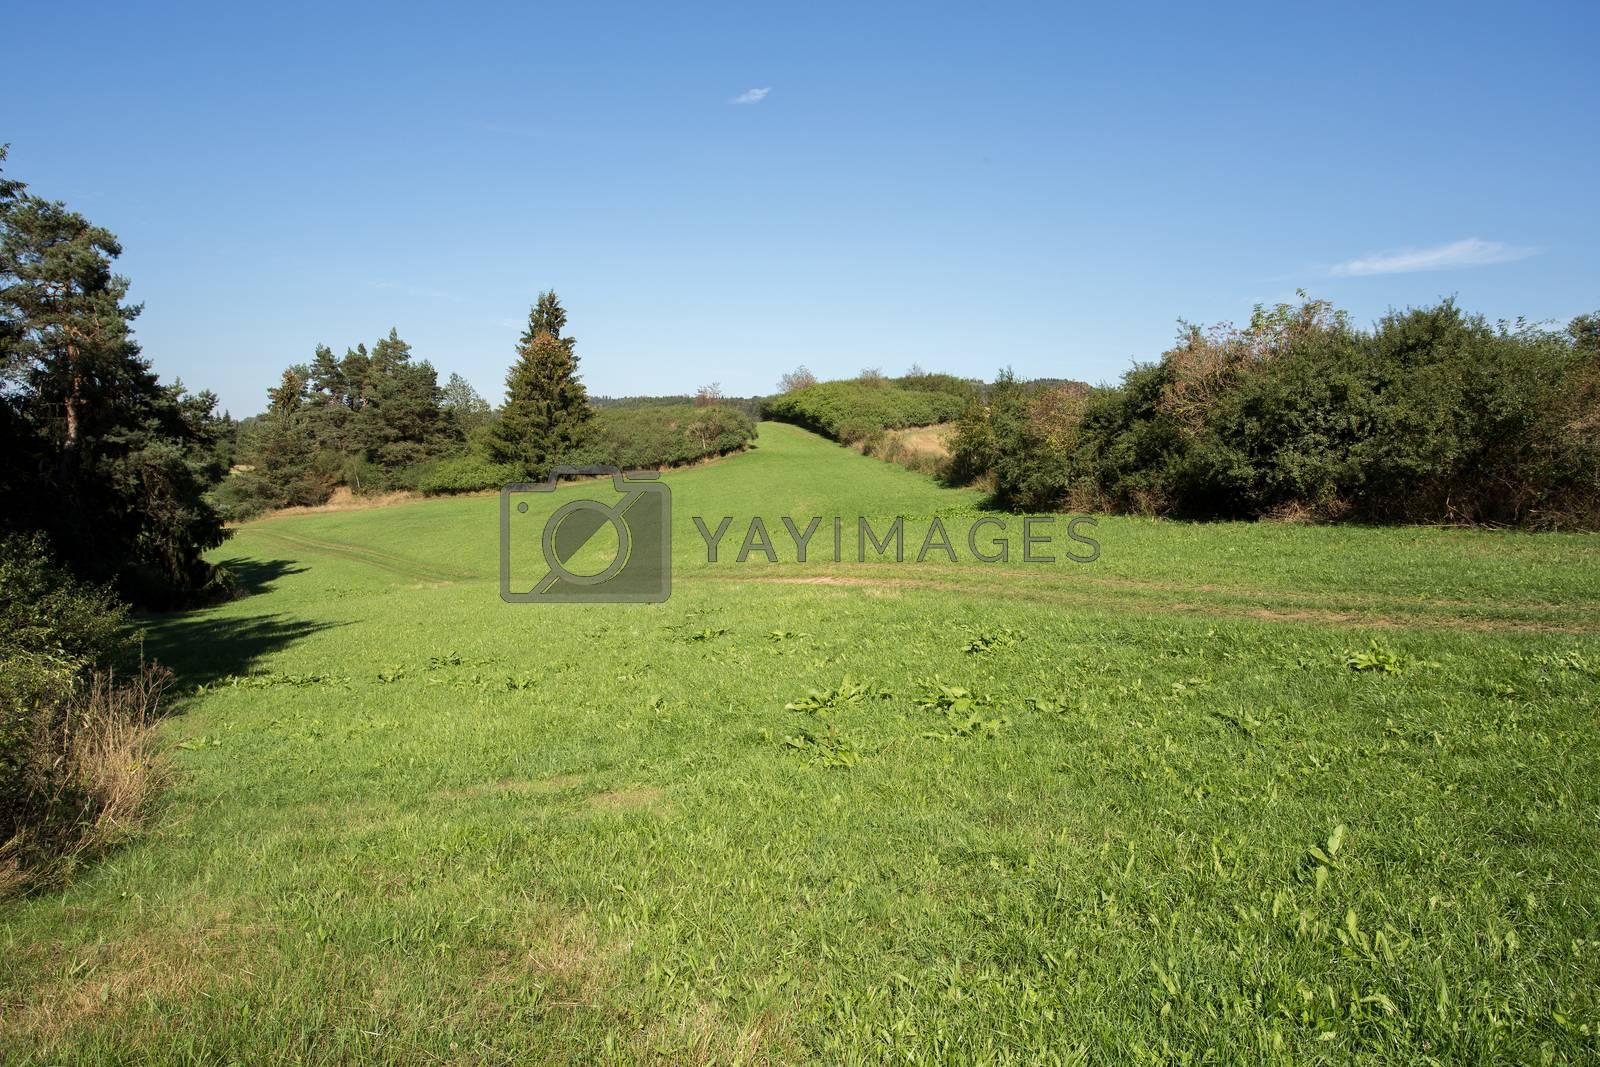 rural summer landscape in czech Republic - region Vysocina